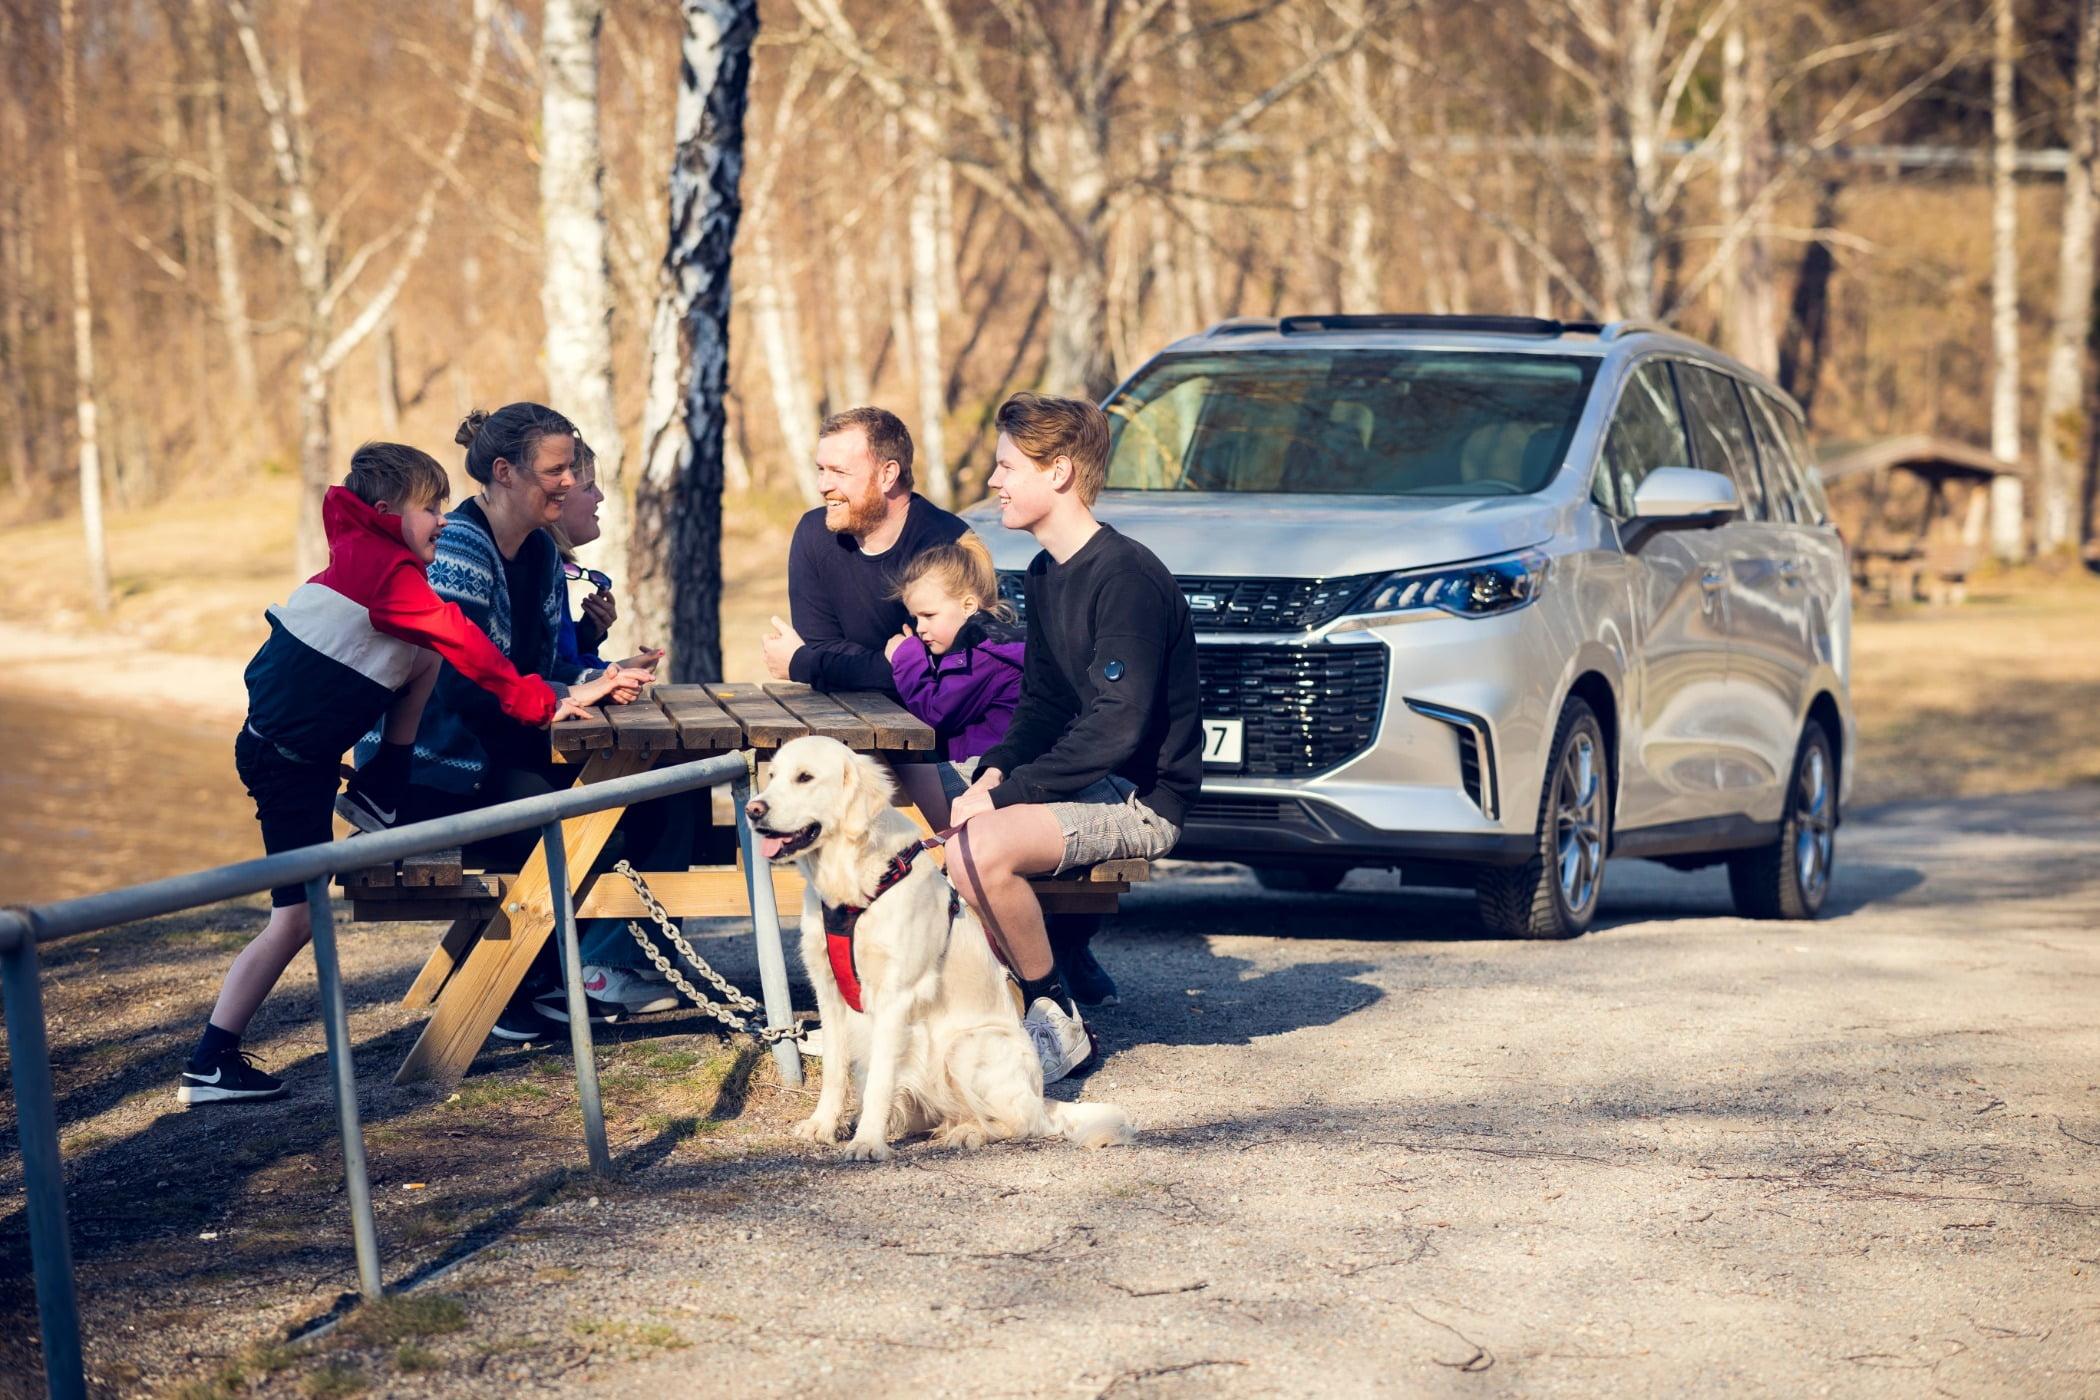 Land vehicle, Automotive design, Tire, Car, Dog, Wheel, Carnivore, Tree